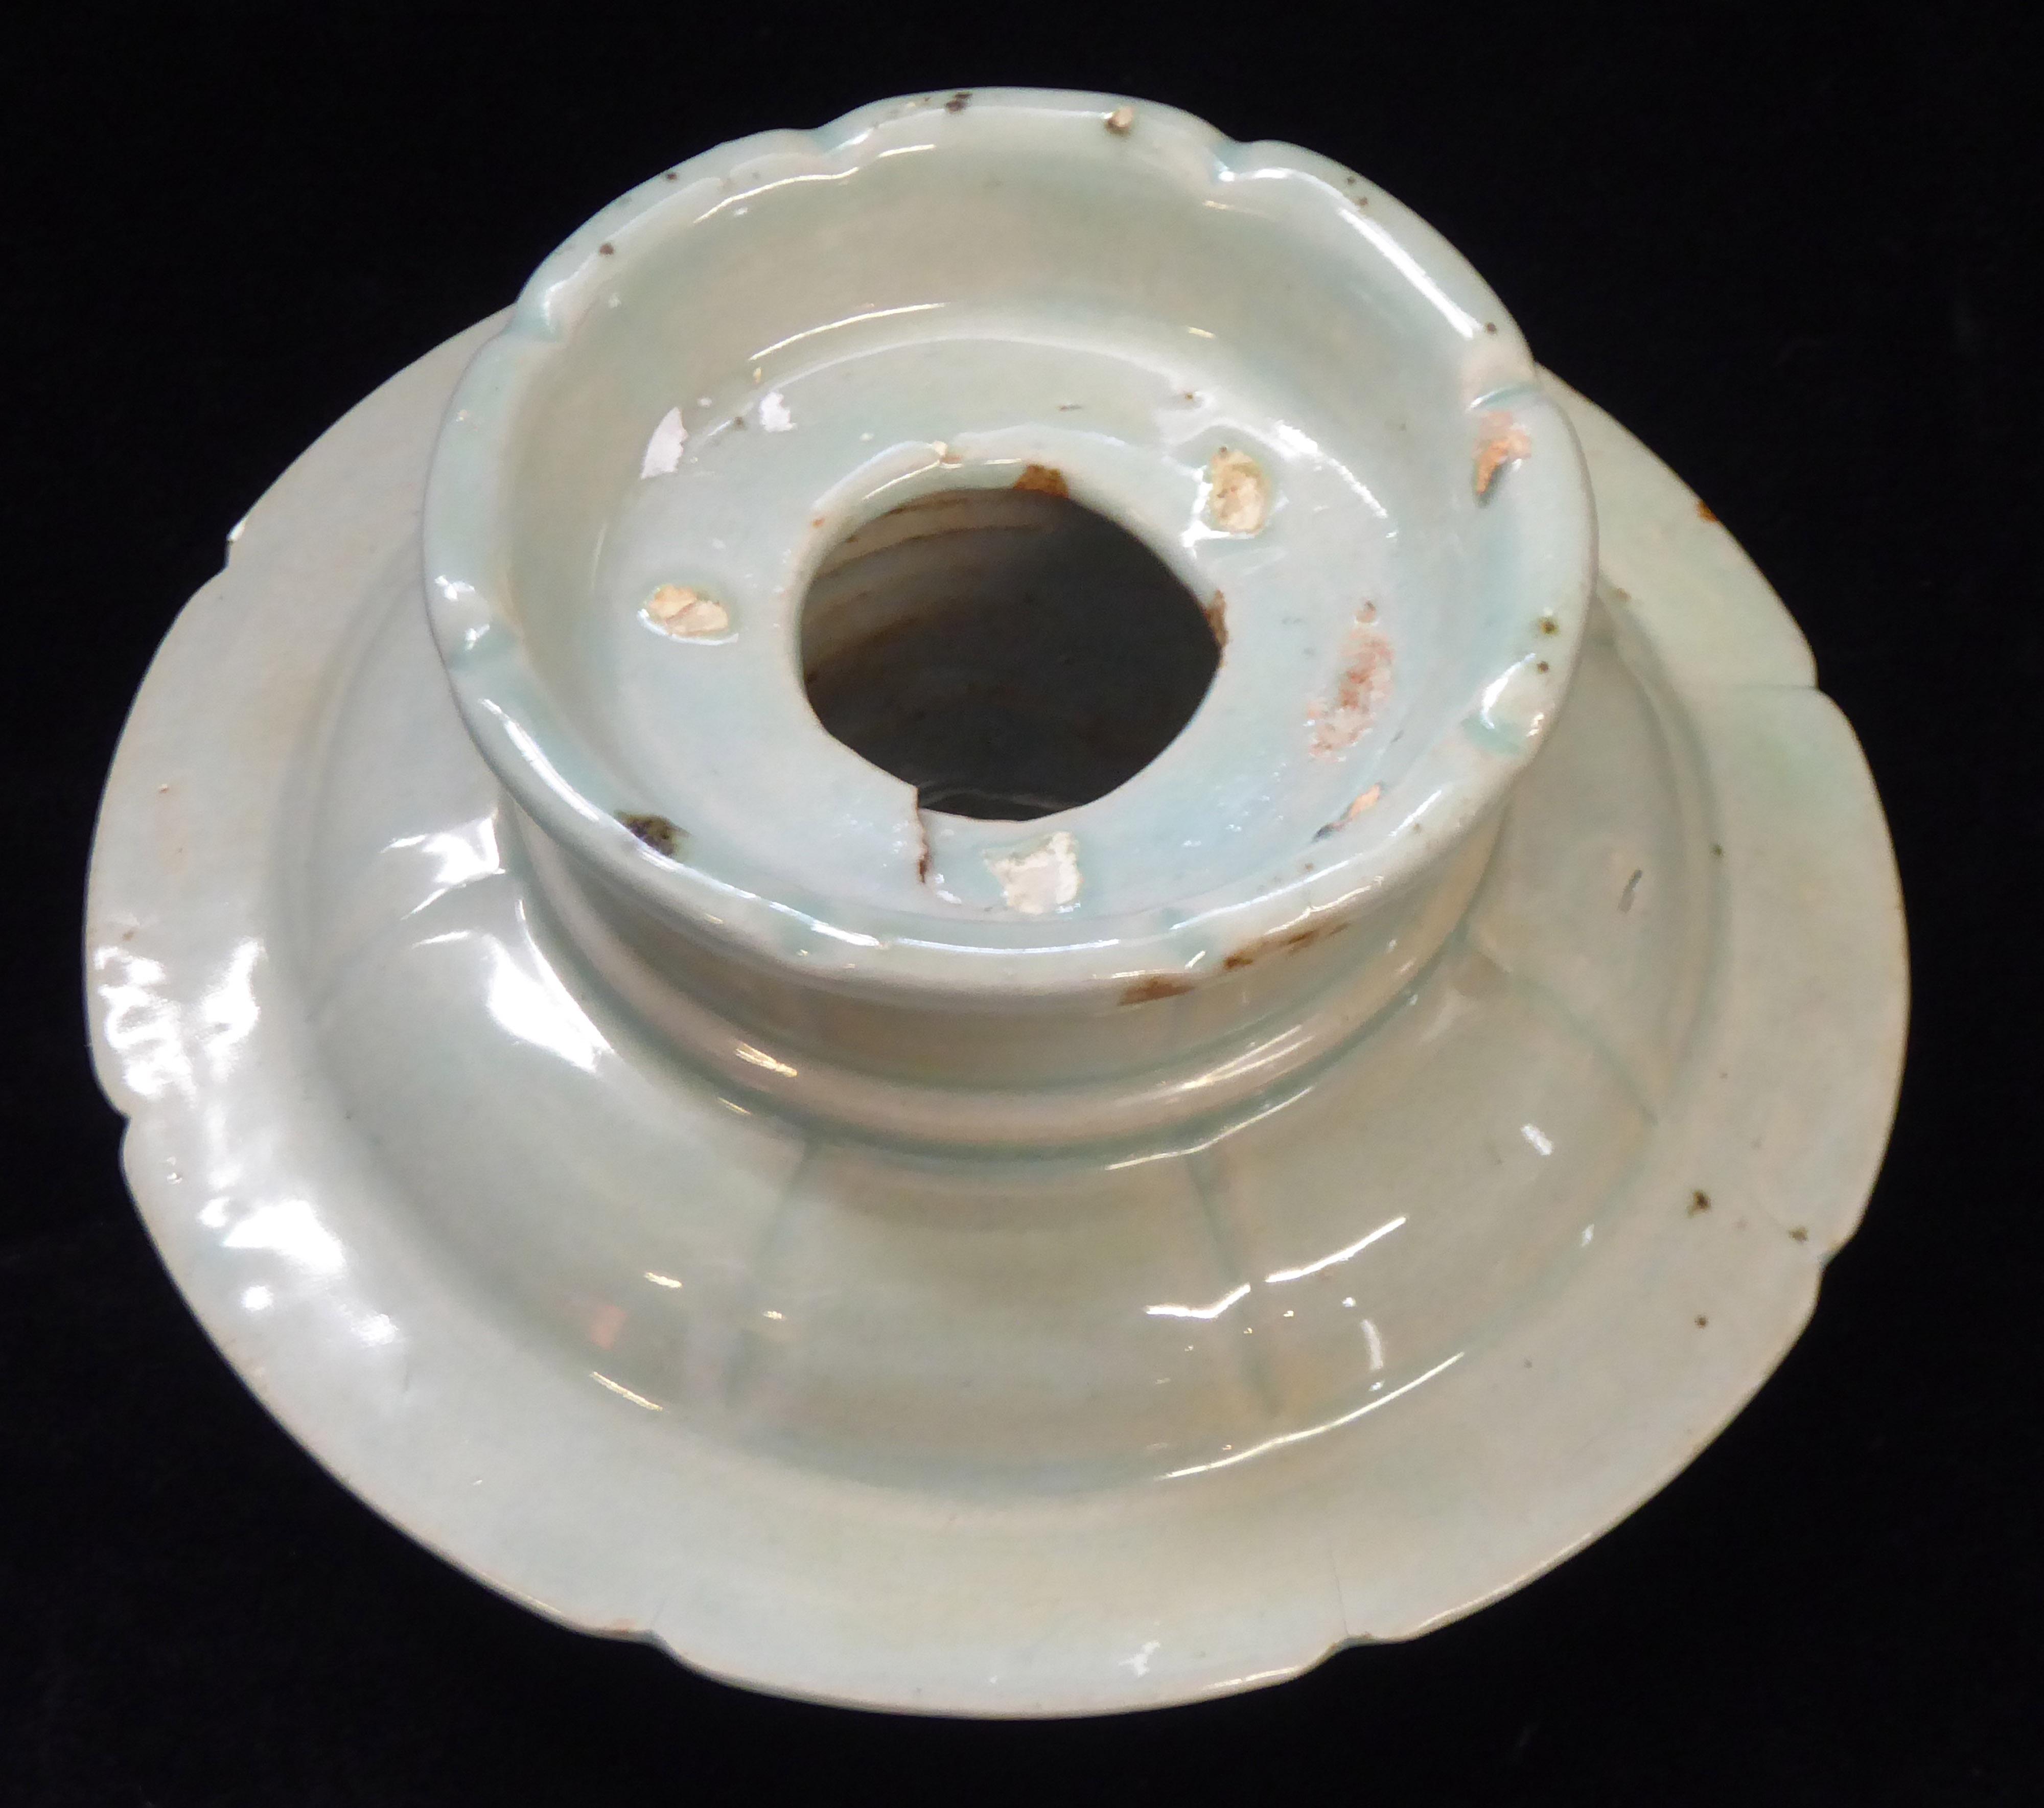 Lot 157 - A KOREAN GORYEO DYNASTY CELADON GLAZED POTTERY LOTUS DISH Spherical form having a raised platform